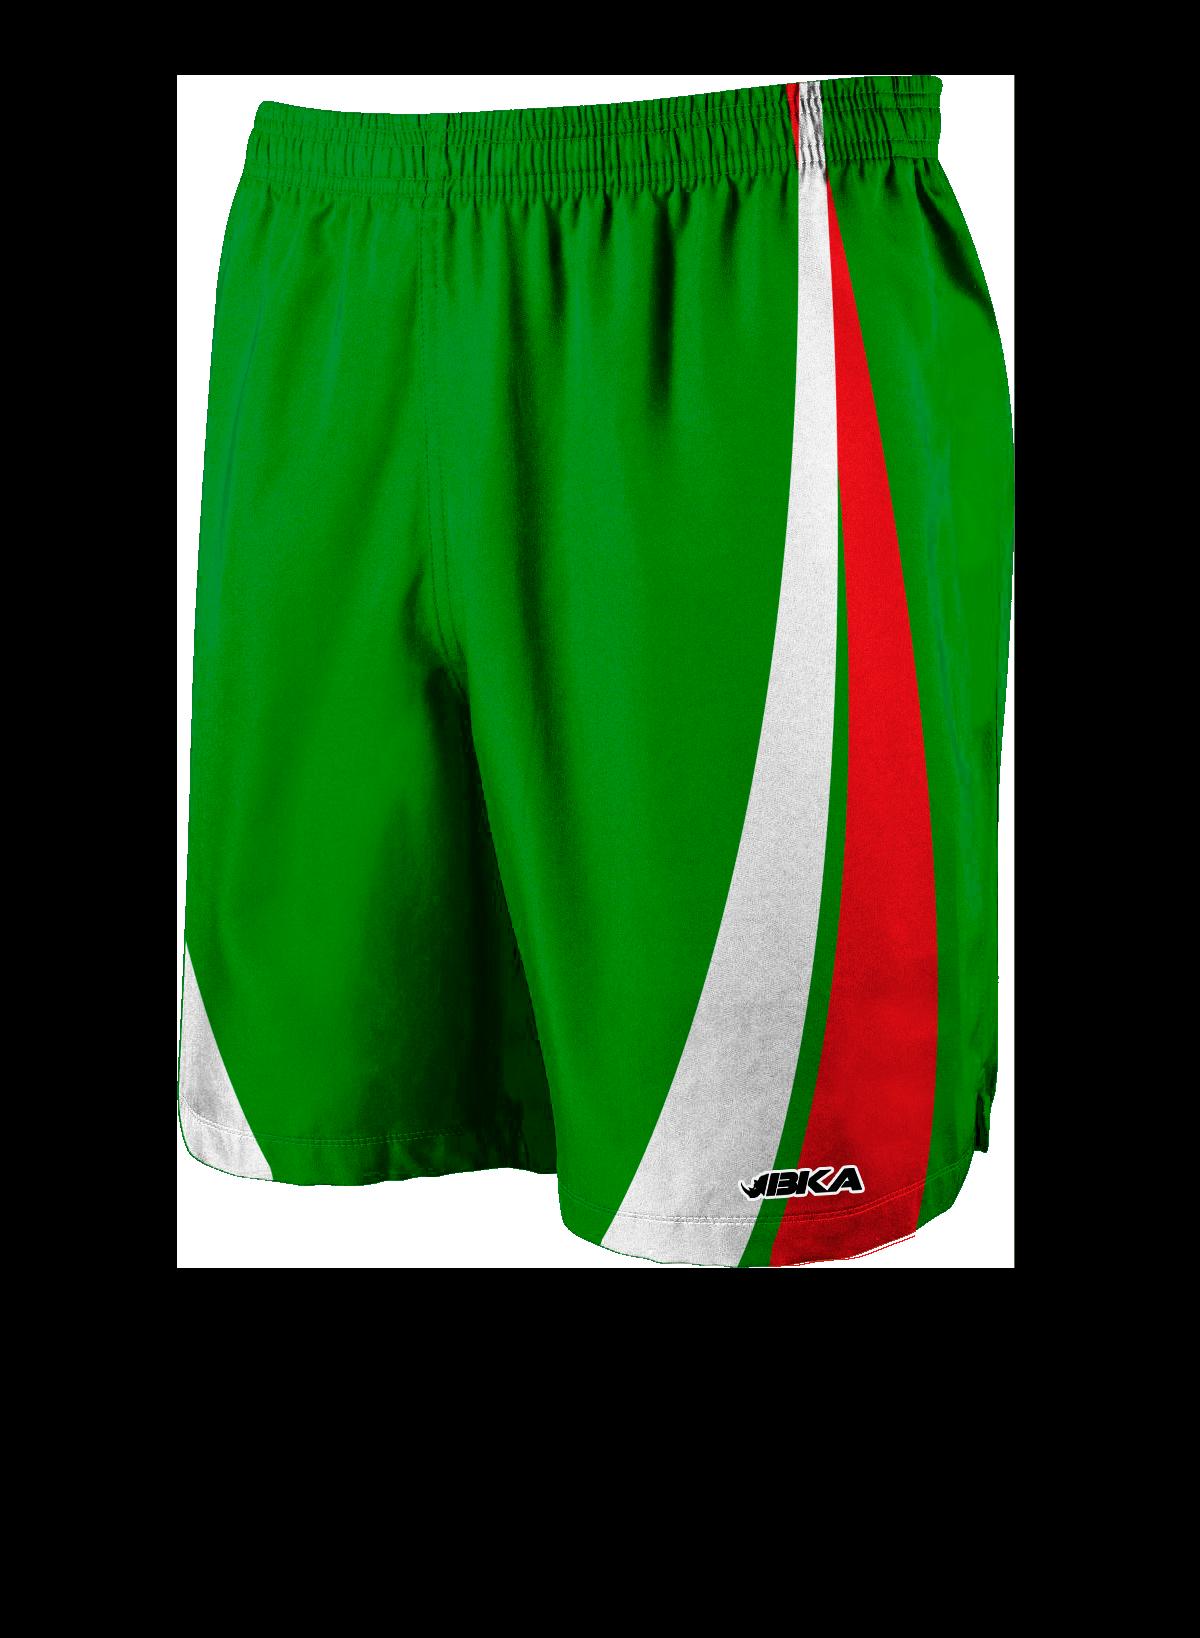 pantalon line verde